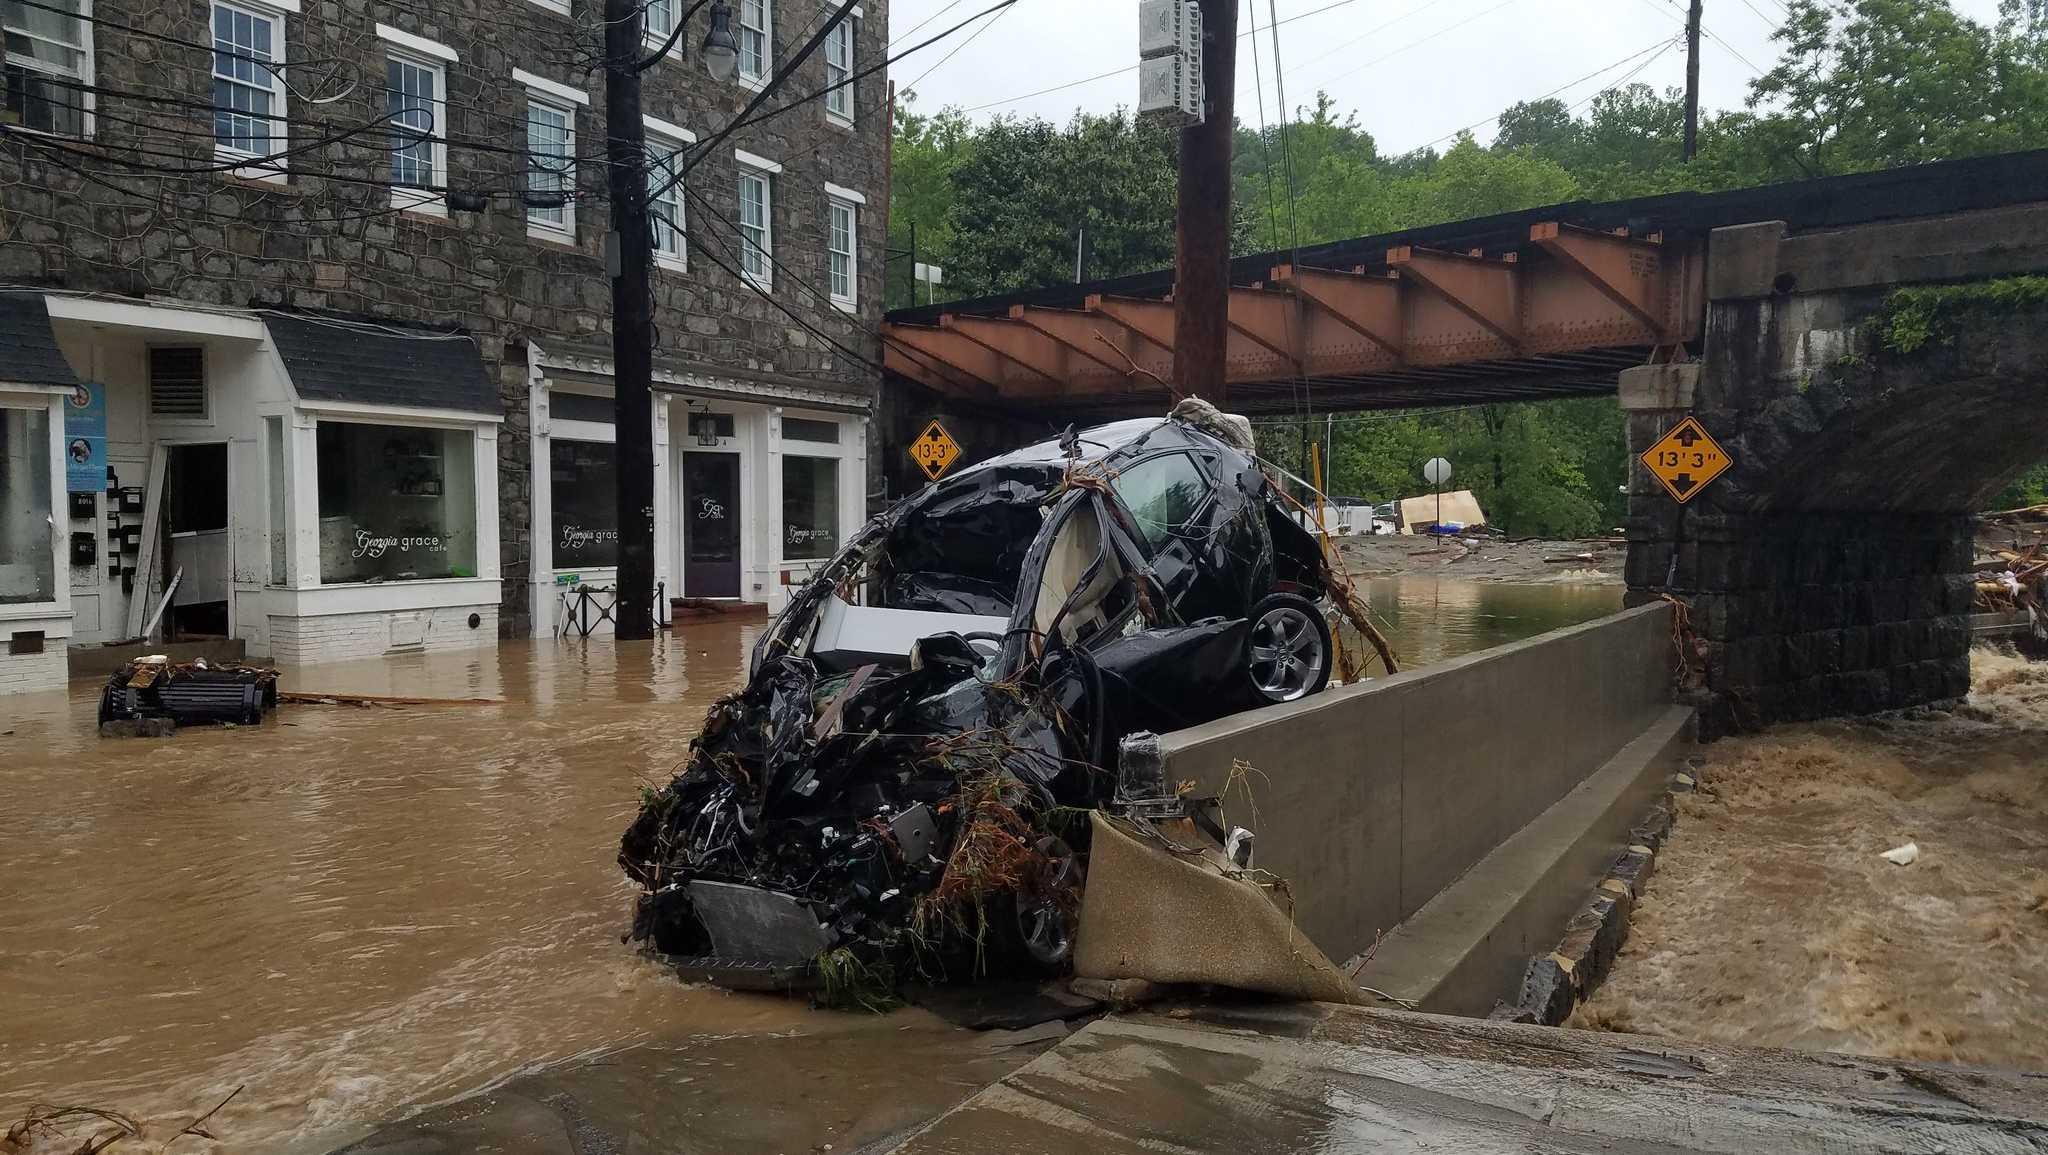 Ellicott City flooding